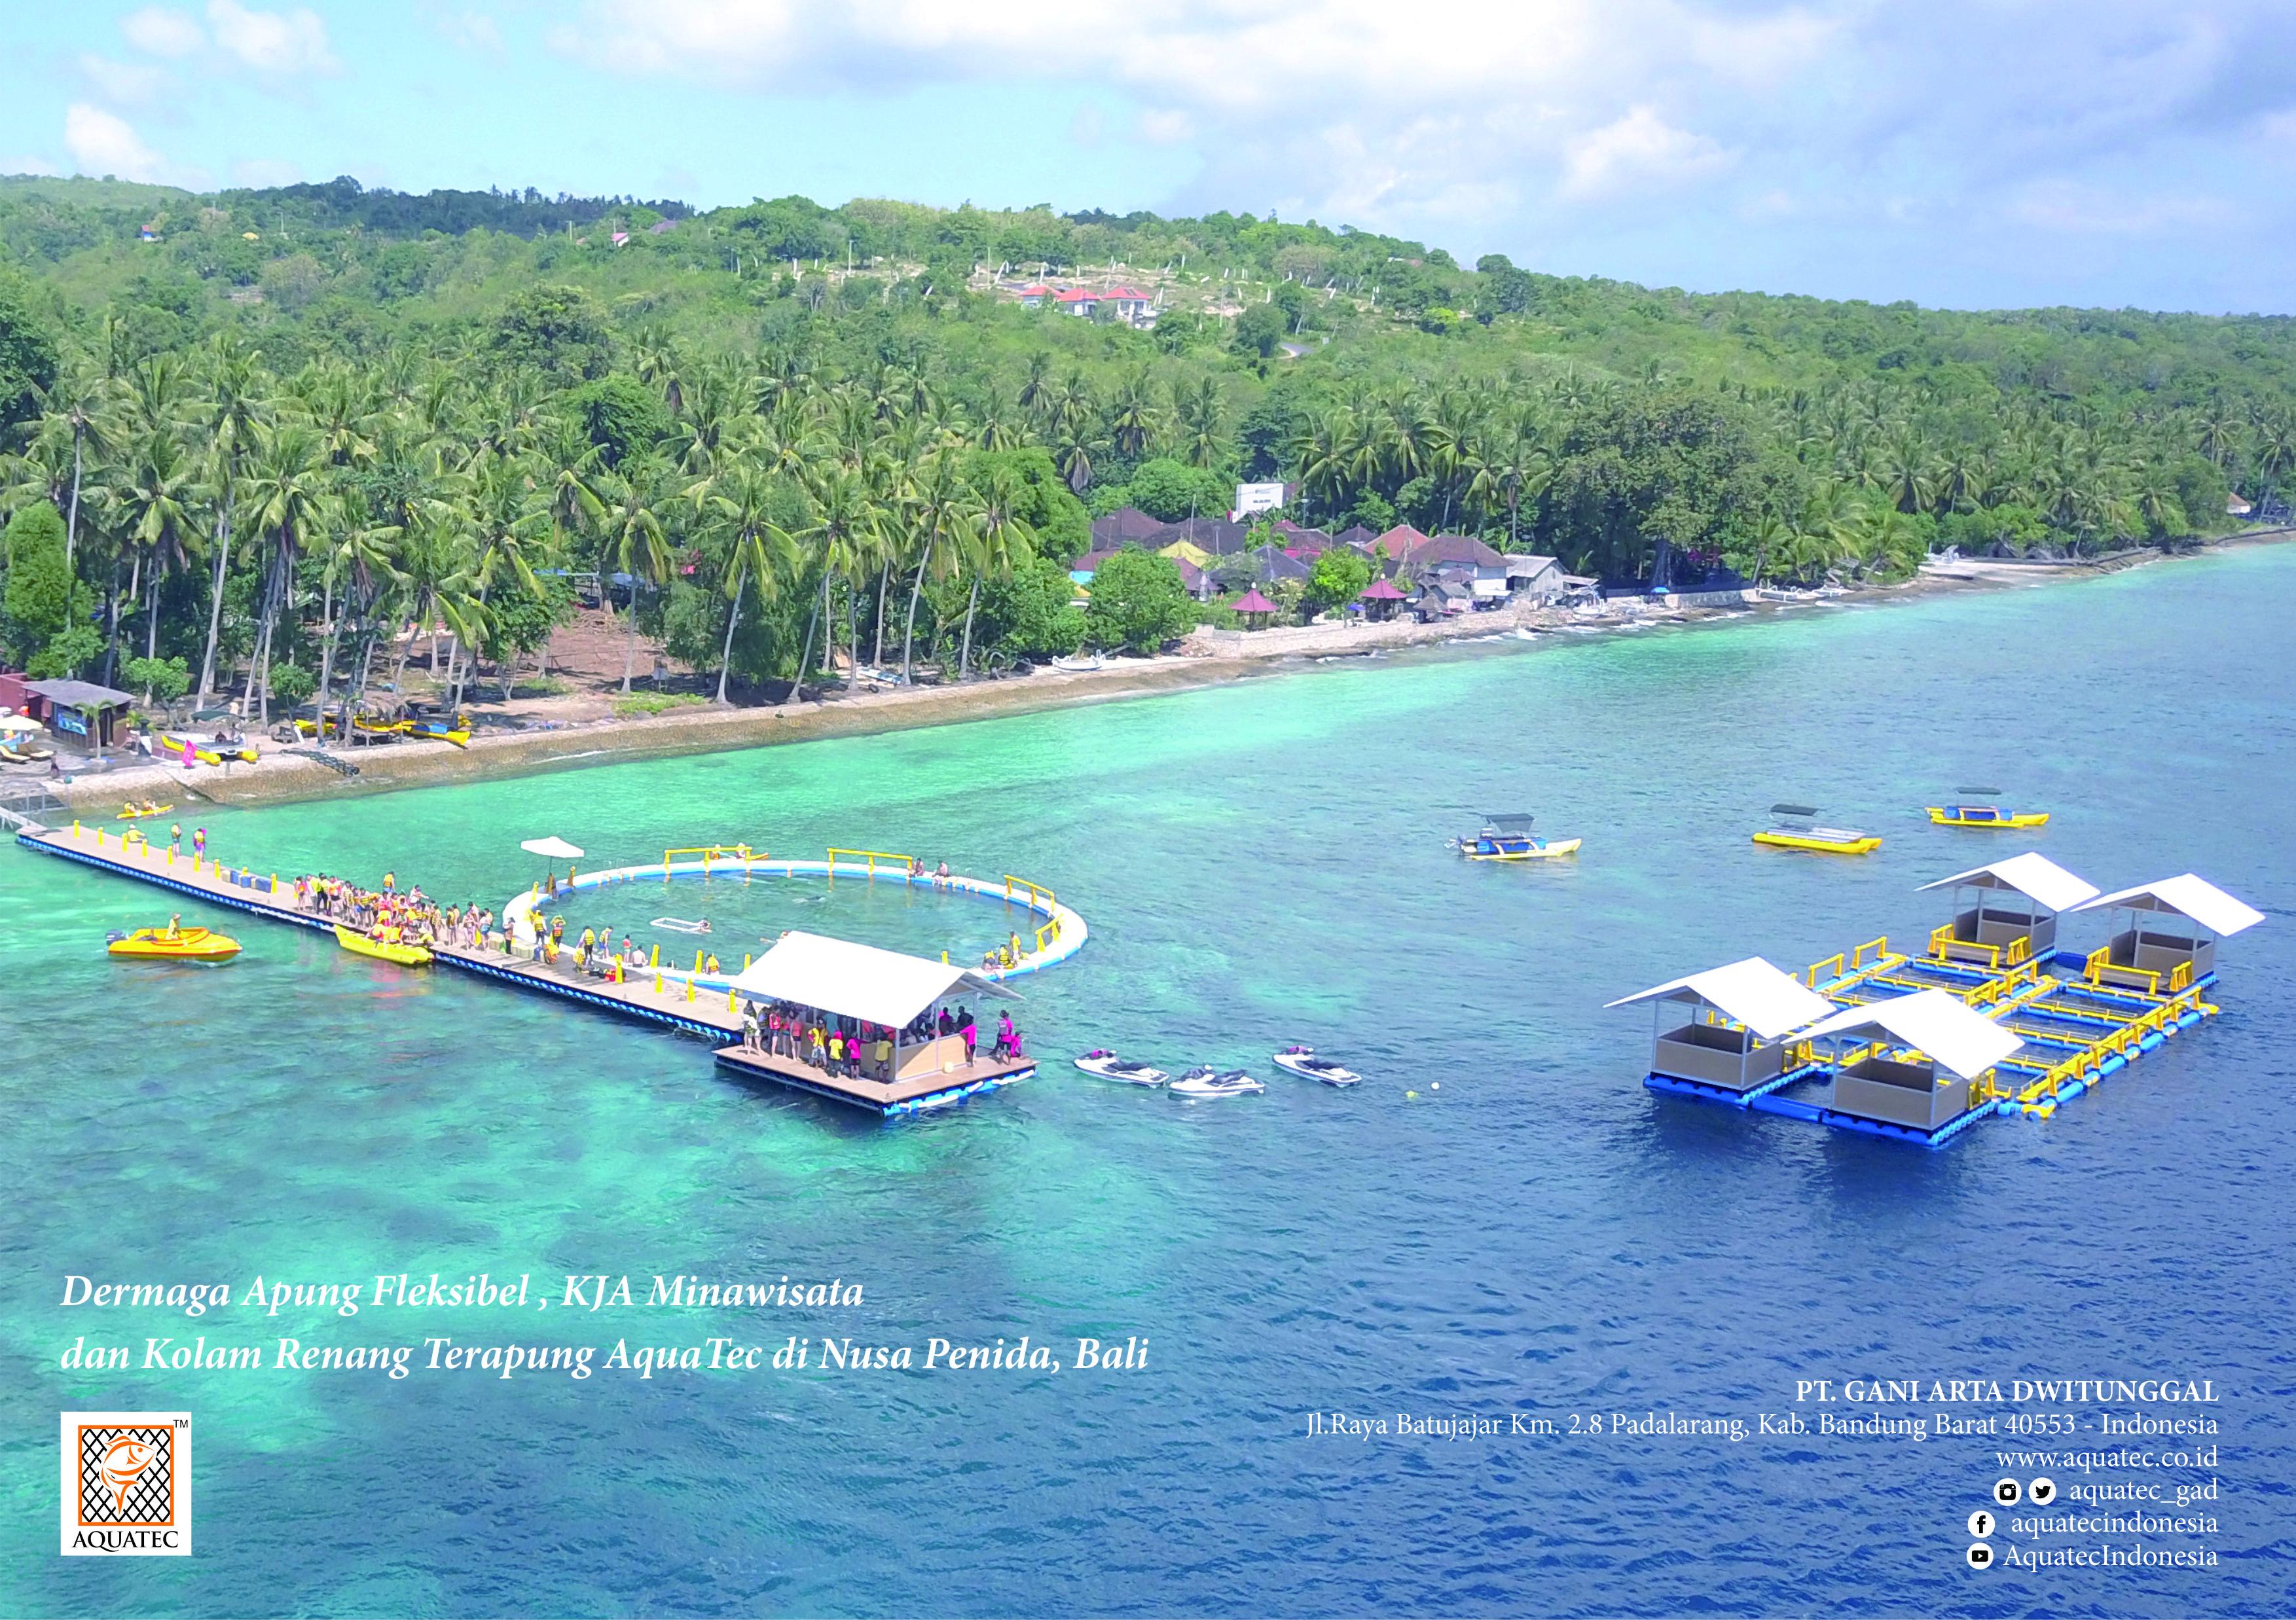 Role Of Aquatec Floating Dock In Improving Tourism Nusa Penida Paket Trip Bali Island